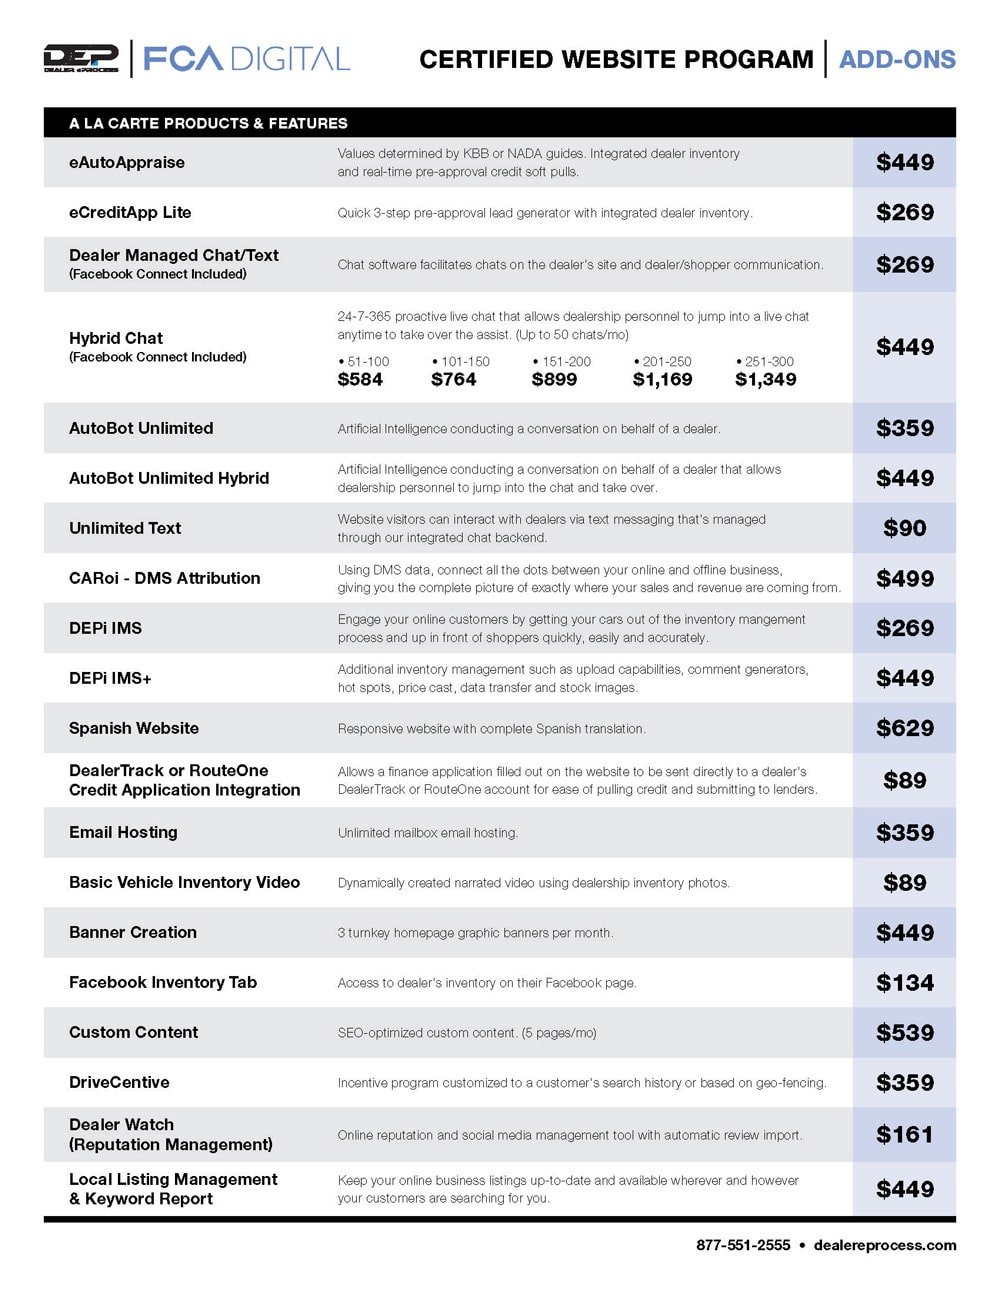 FCA website price sheet